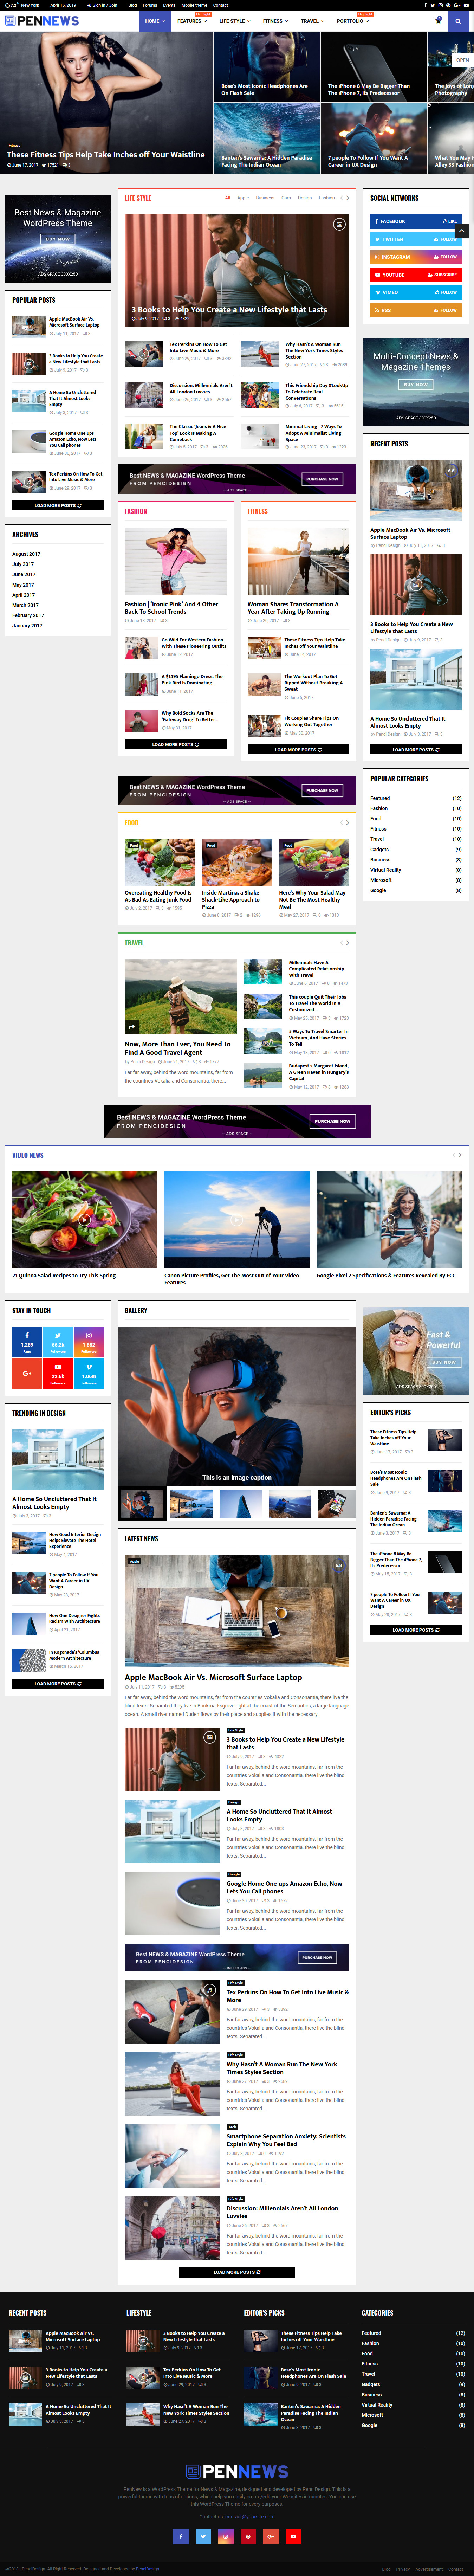 pennews best premium review wordpress theme - 10+ Best Premium Review WordPress Themes